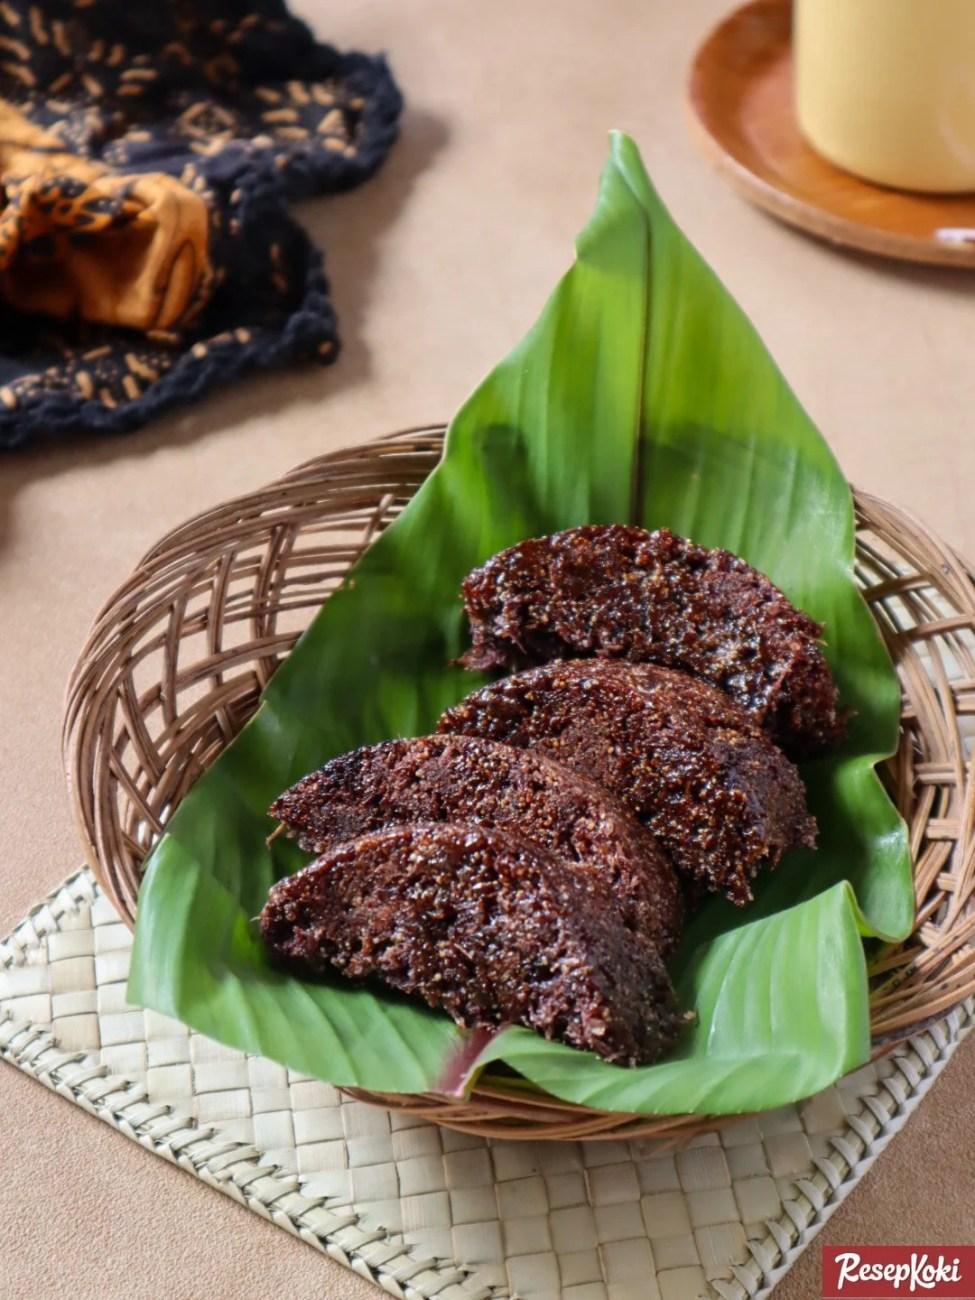 Resep Kue Dange